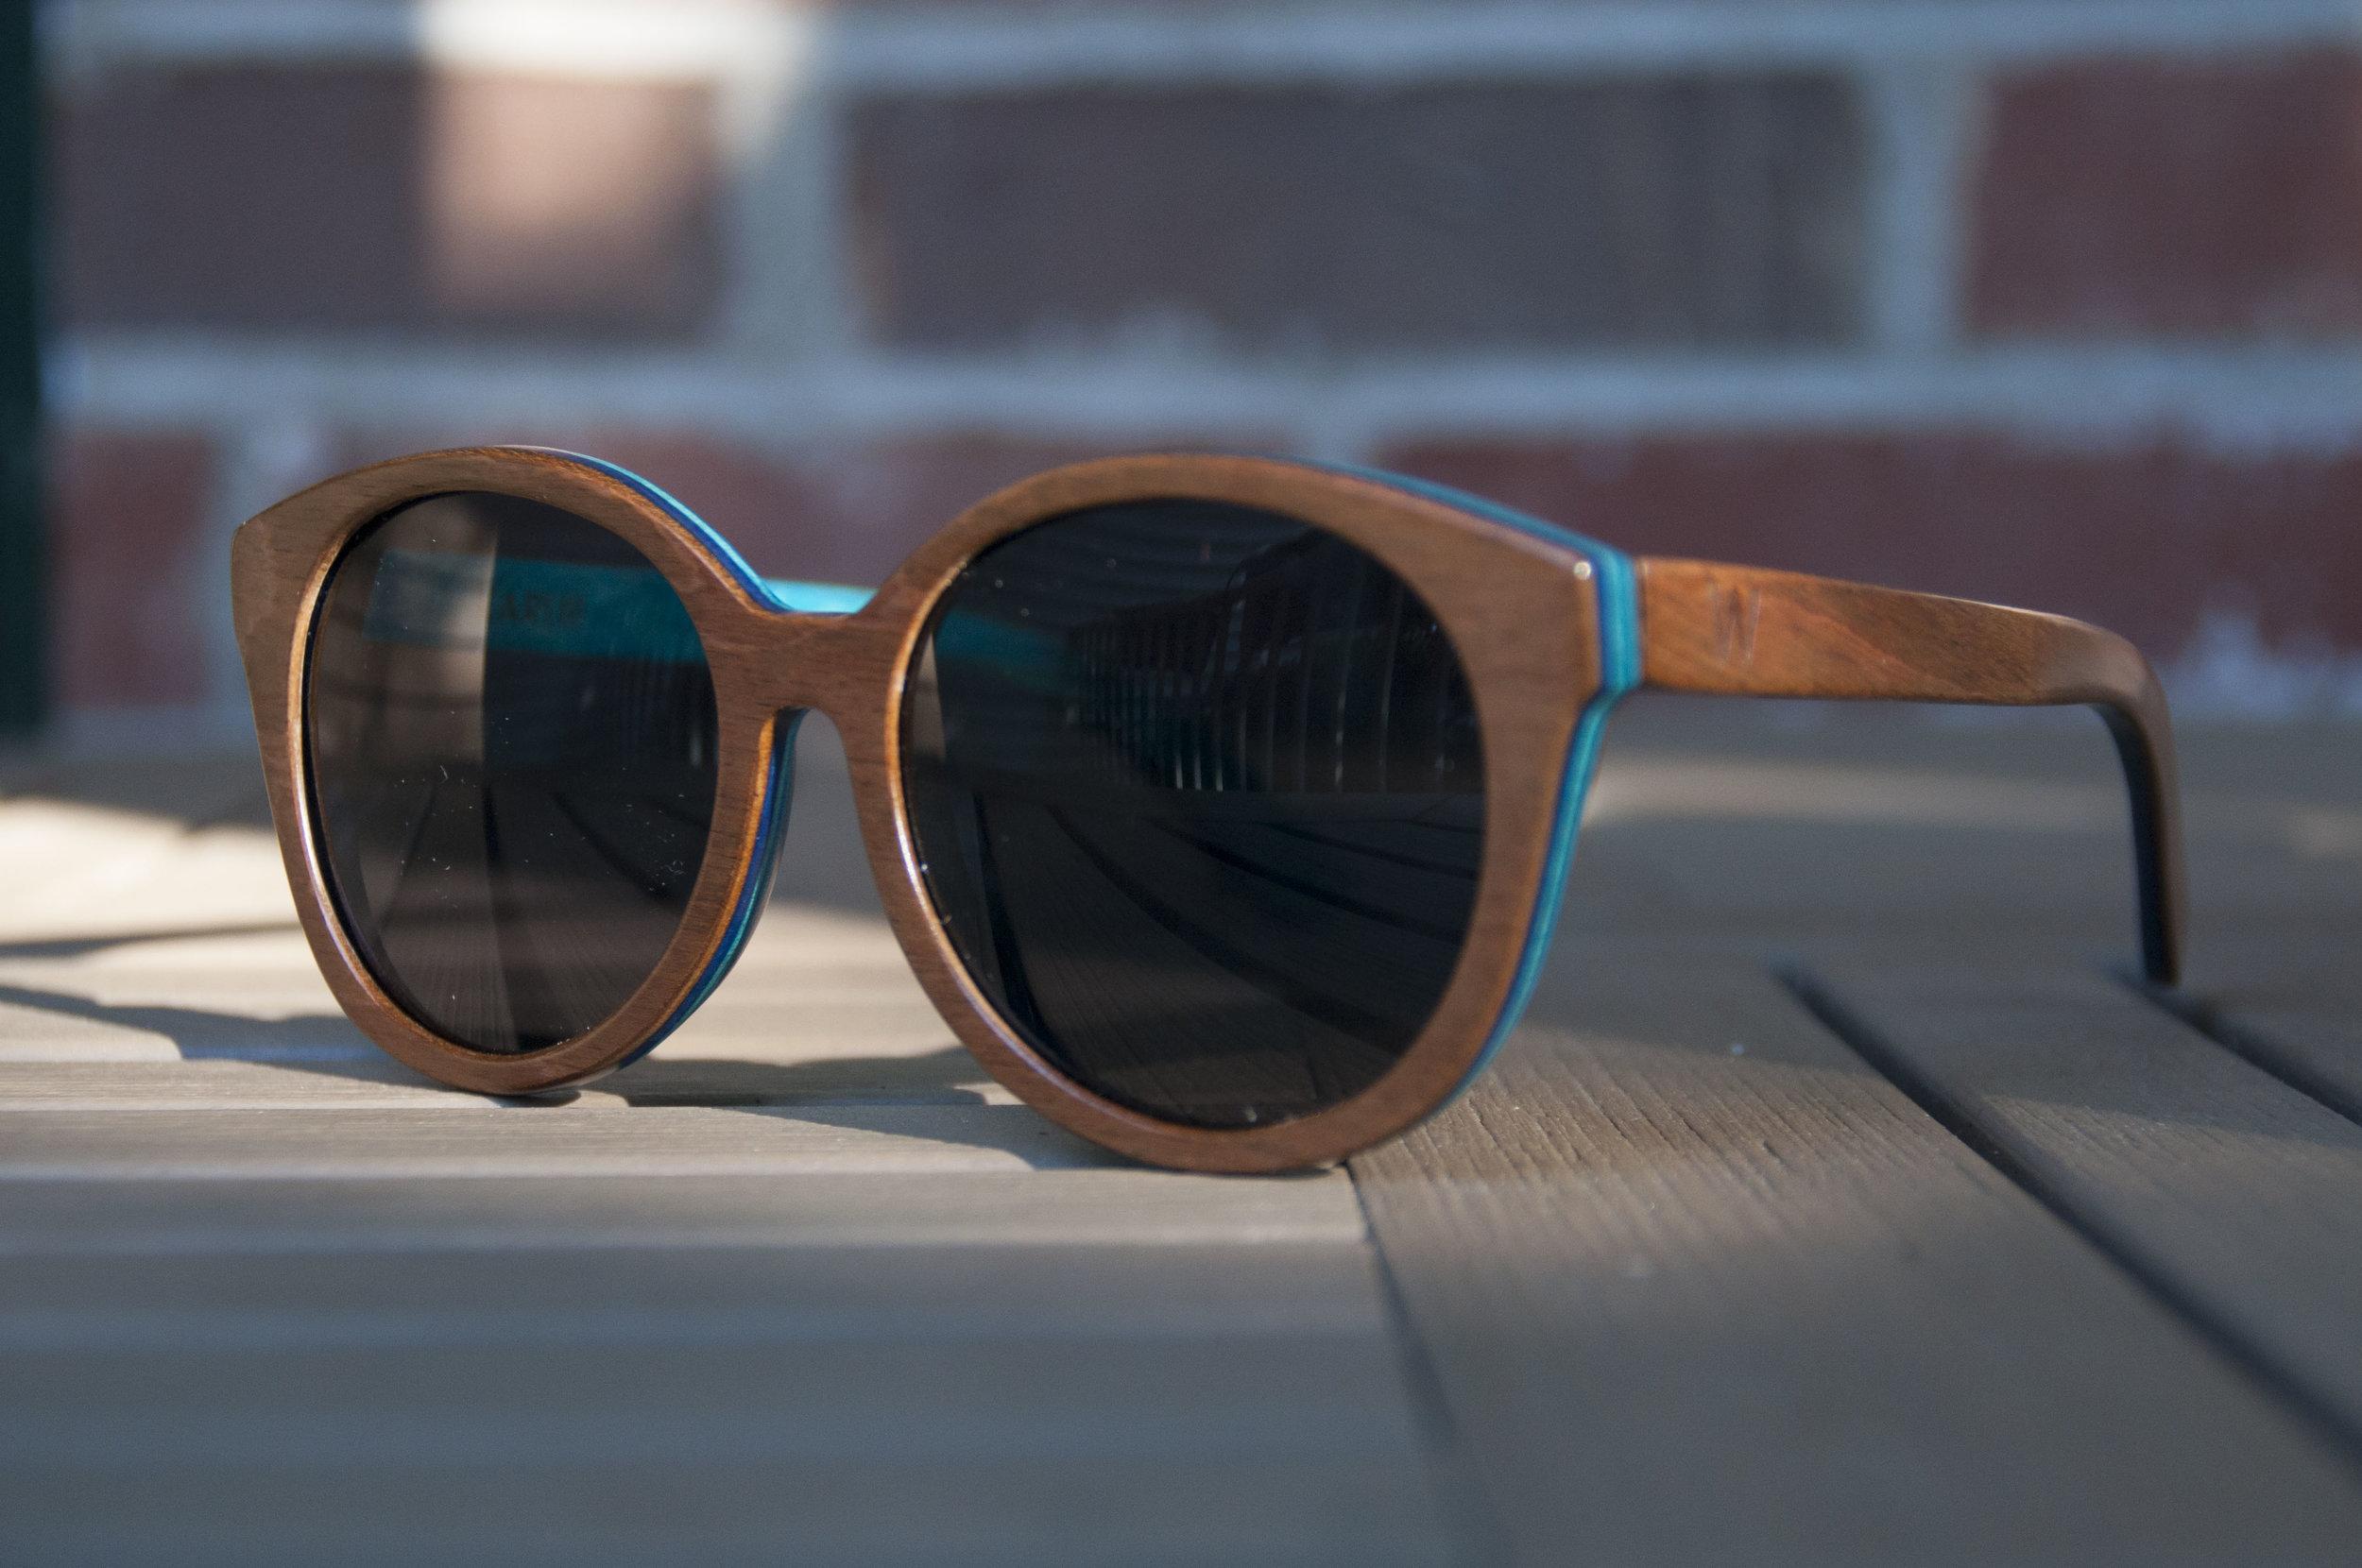 Karlie sunglasses from Woodzee